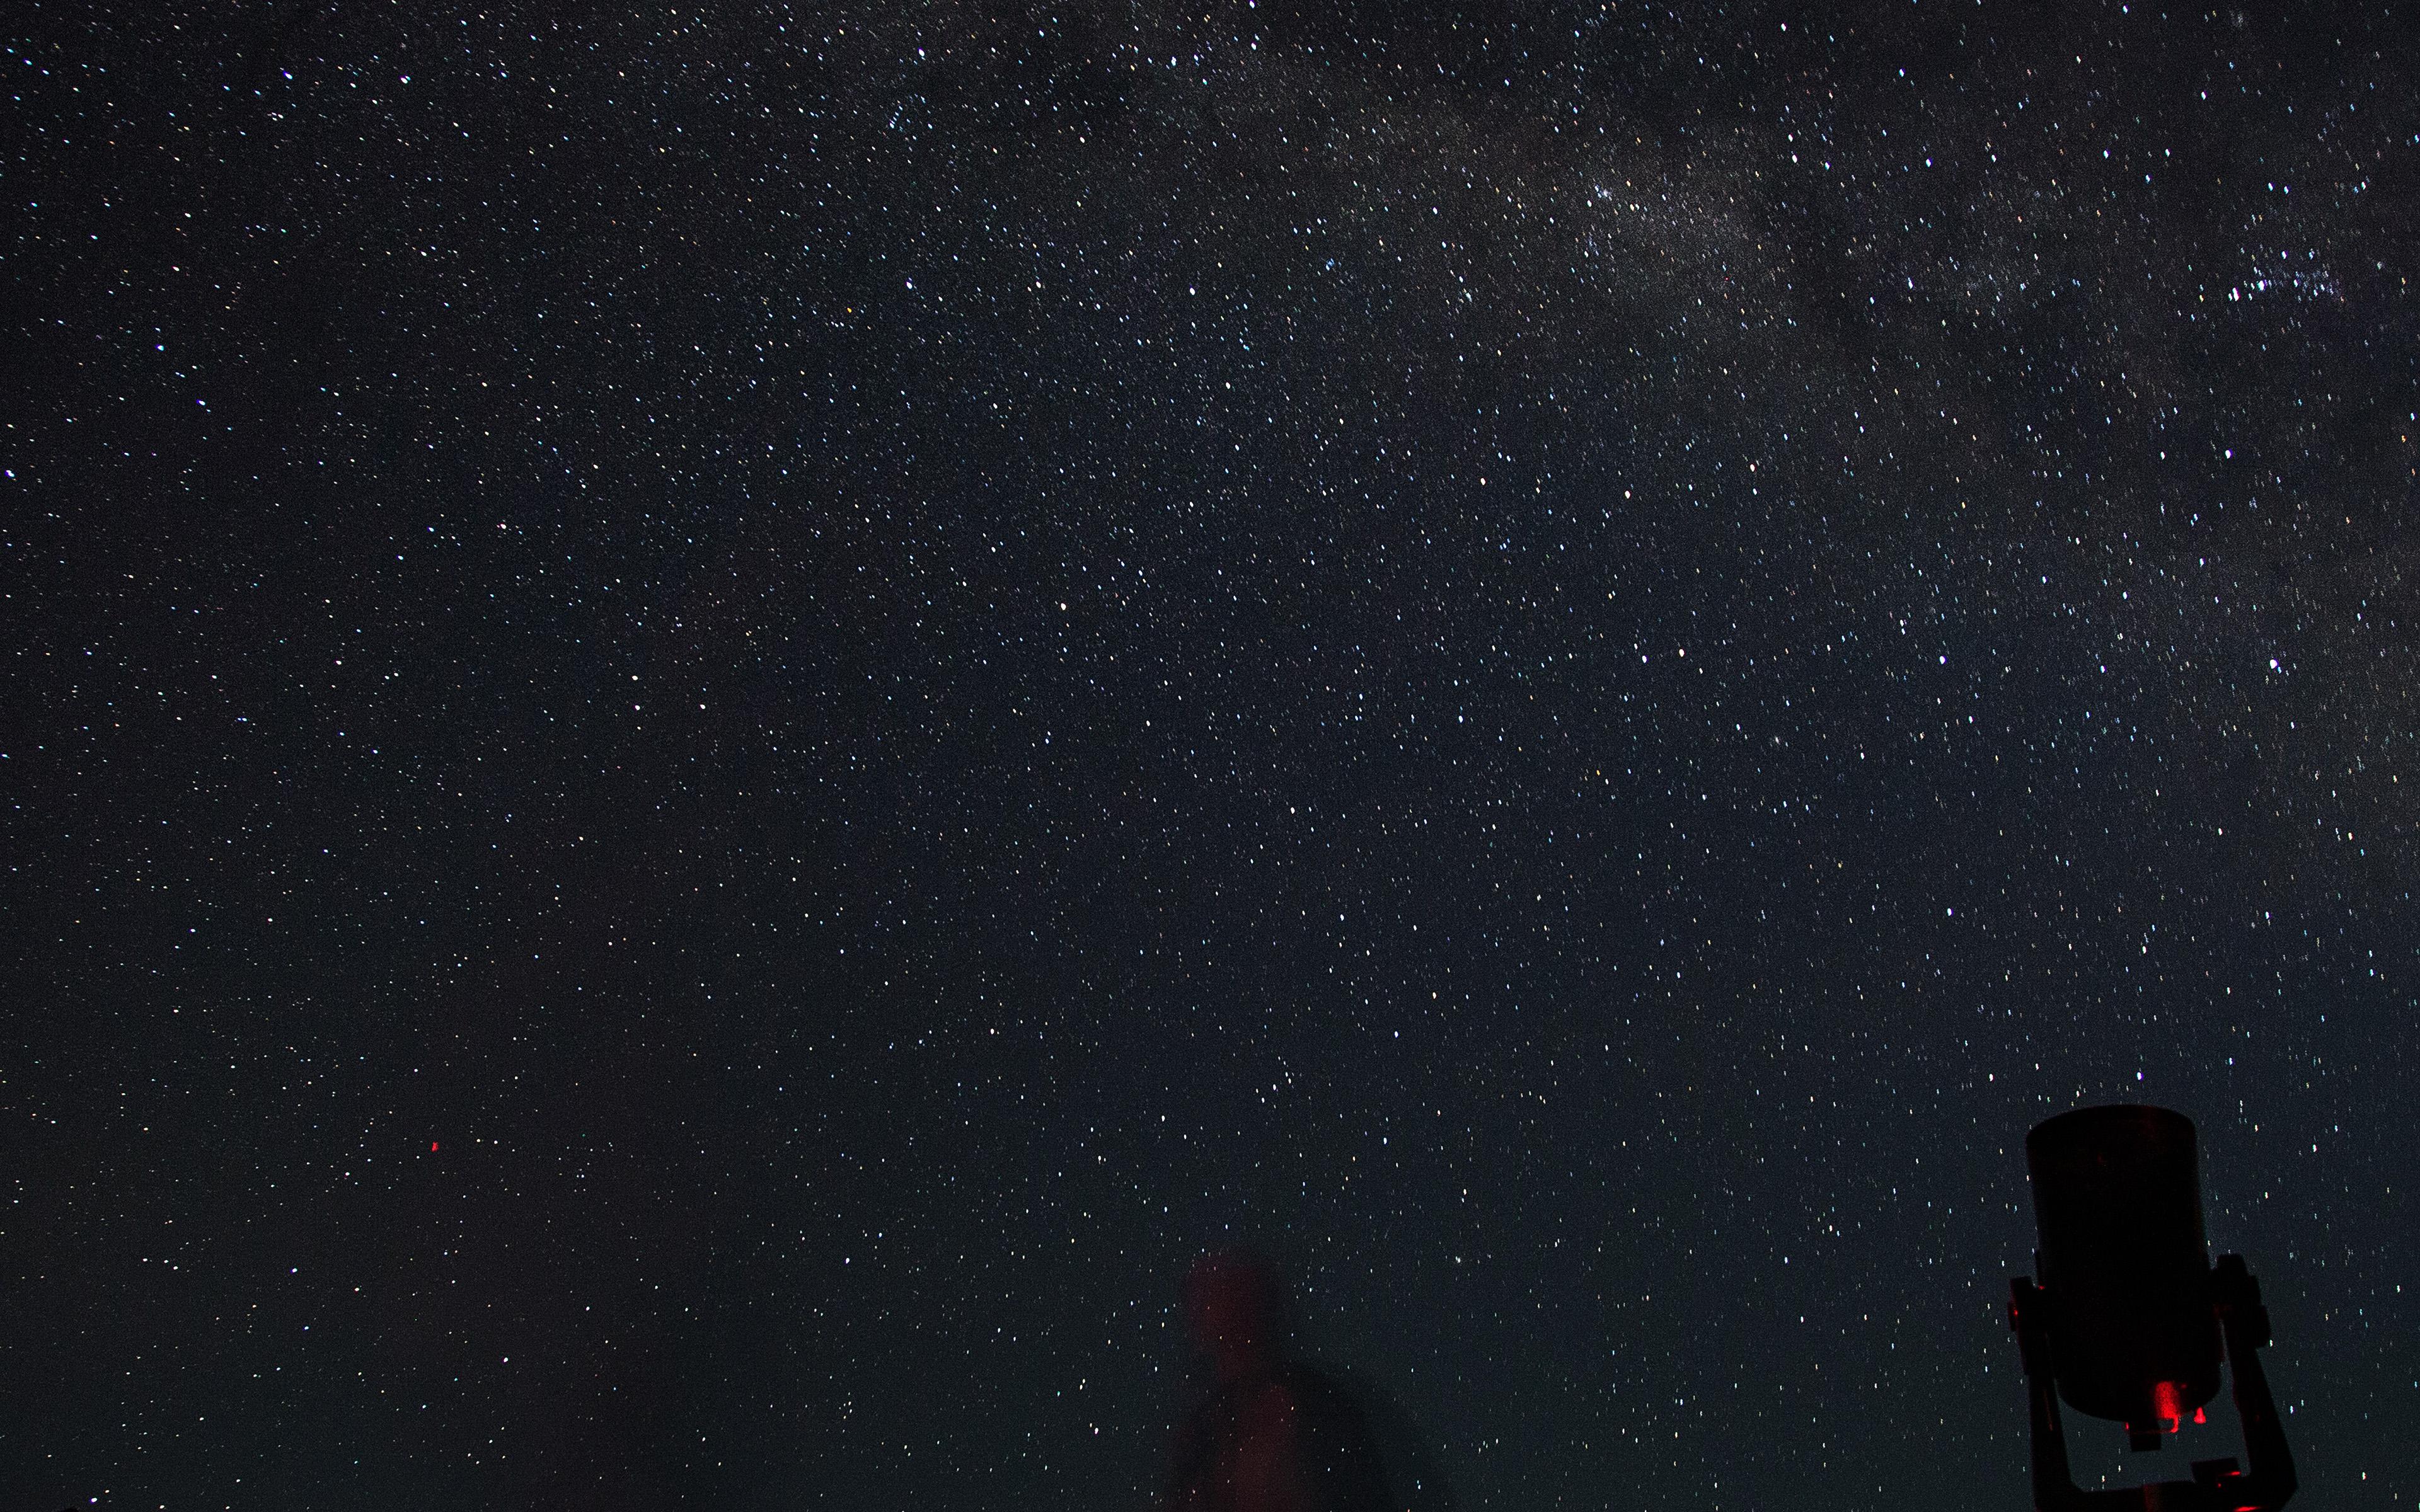 Nj27 Starry Night Sky Space Night Dark Wallpaper